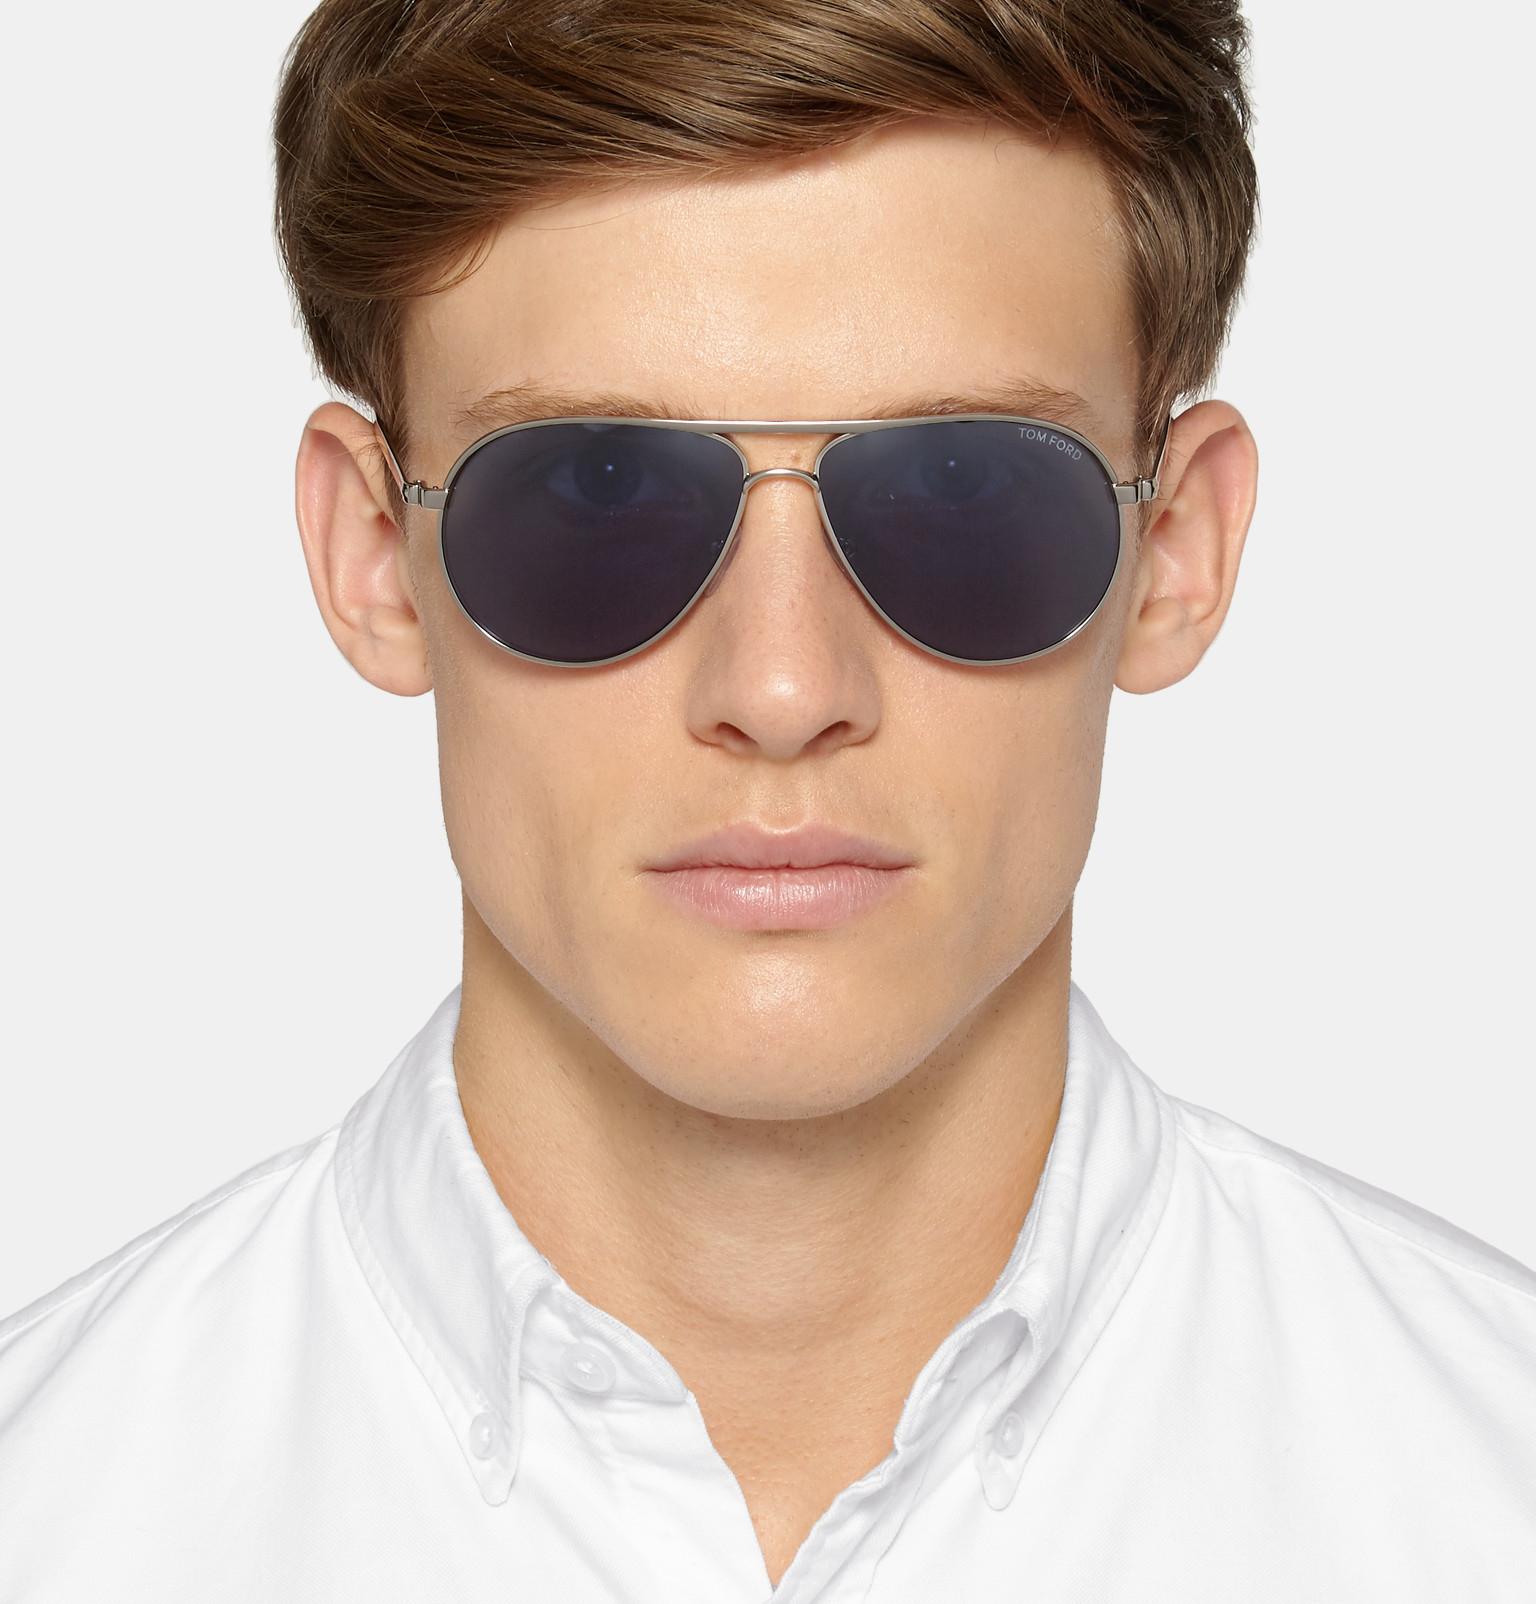 lyst tom ford marko aviator style silver tone sunglasses. Black Bedroom Furniture Sets. Home Design Ideas